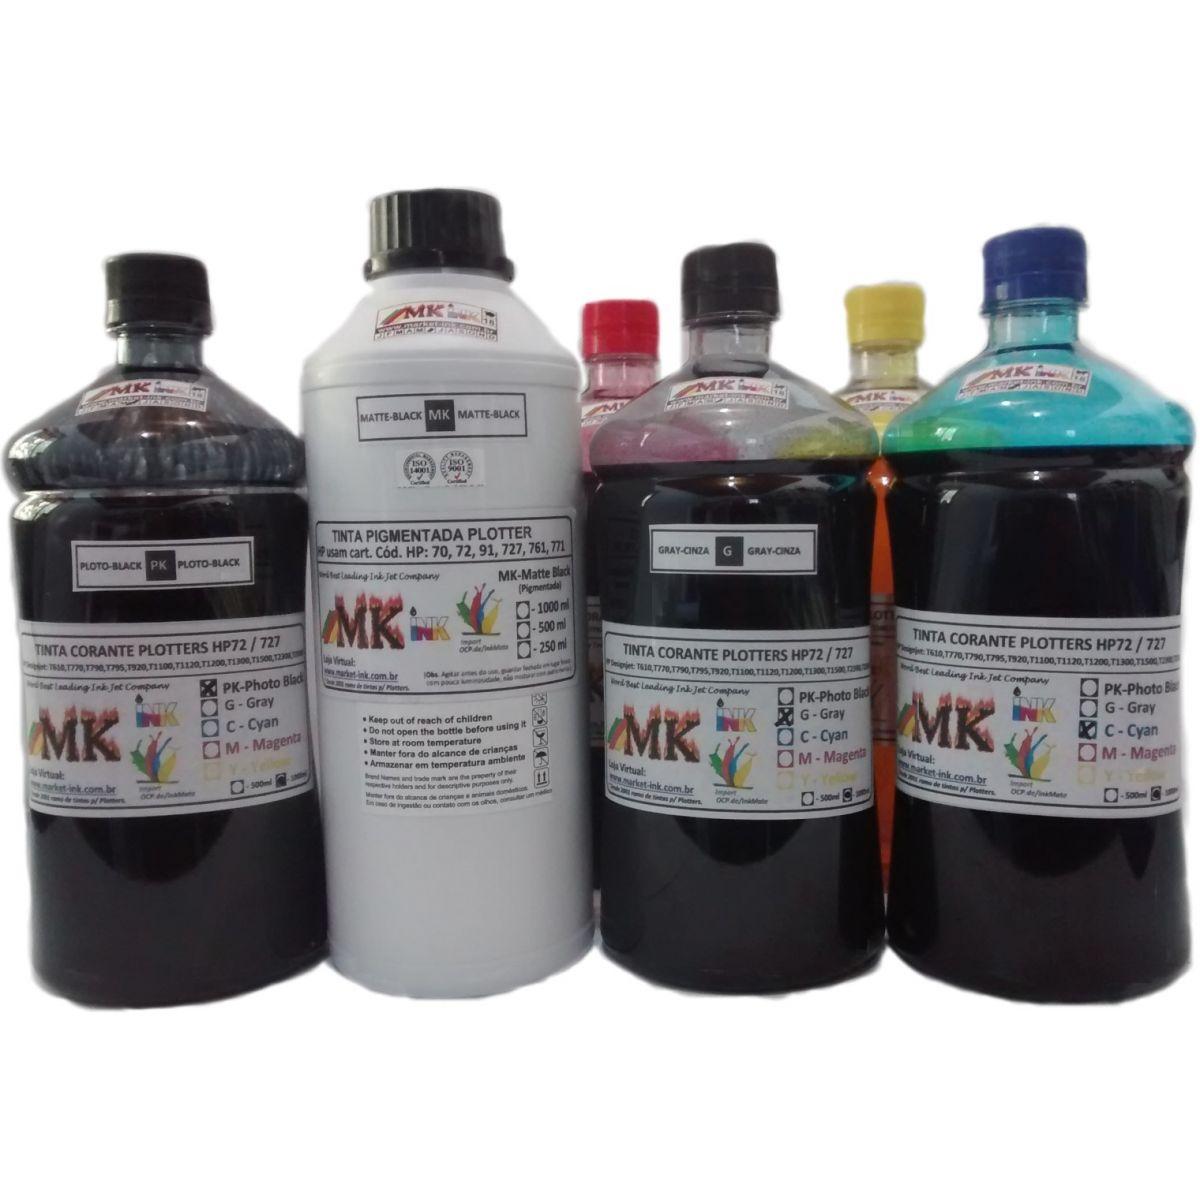 Tinta litro Plotter dos cartuchos HP72, HP727 modelos Plotter HP: T610, T770, T790, T795,T920, T1100, T1120, T1200, T1300, T1500, T2300, T2500